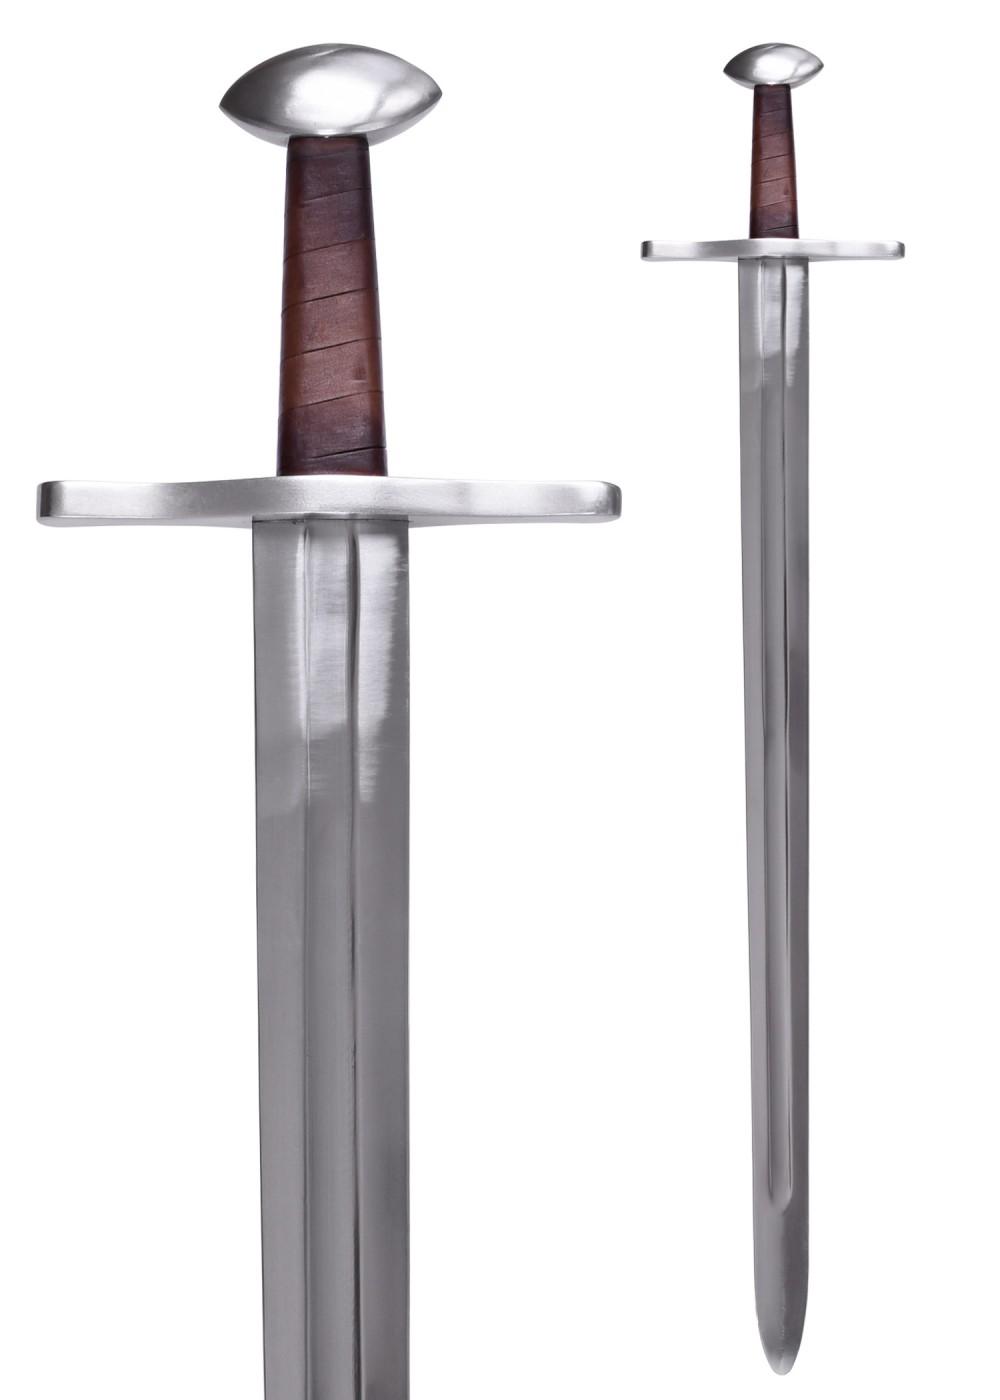 Spada Vichinga - Spada Medievale